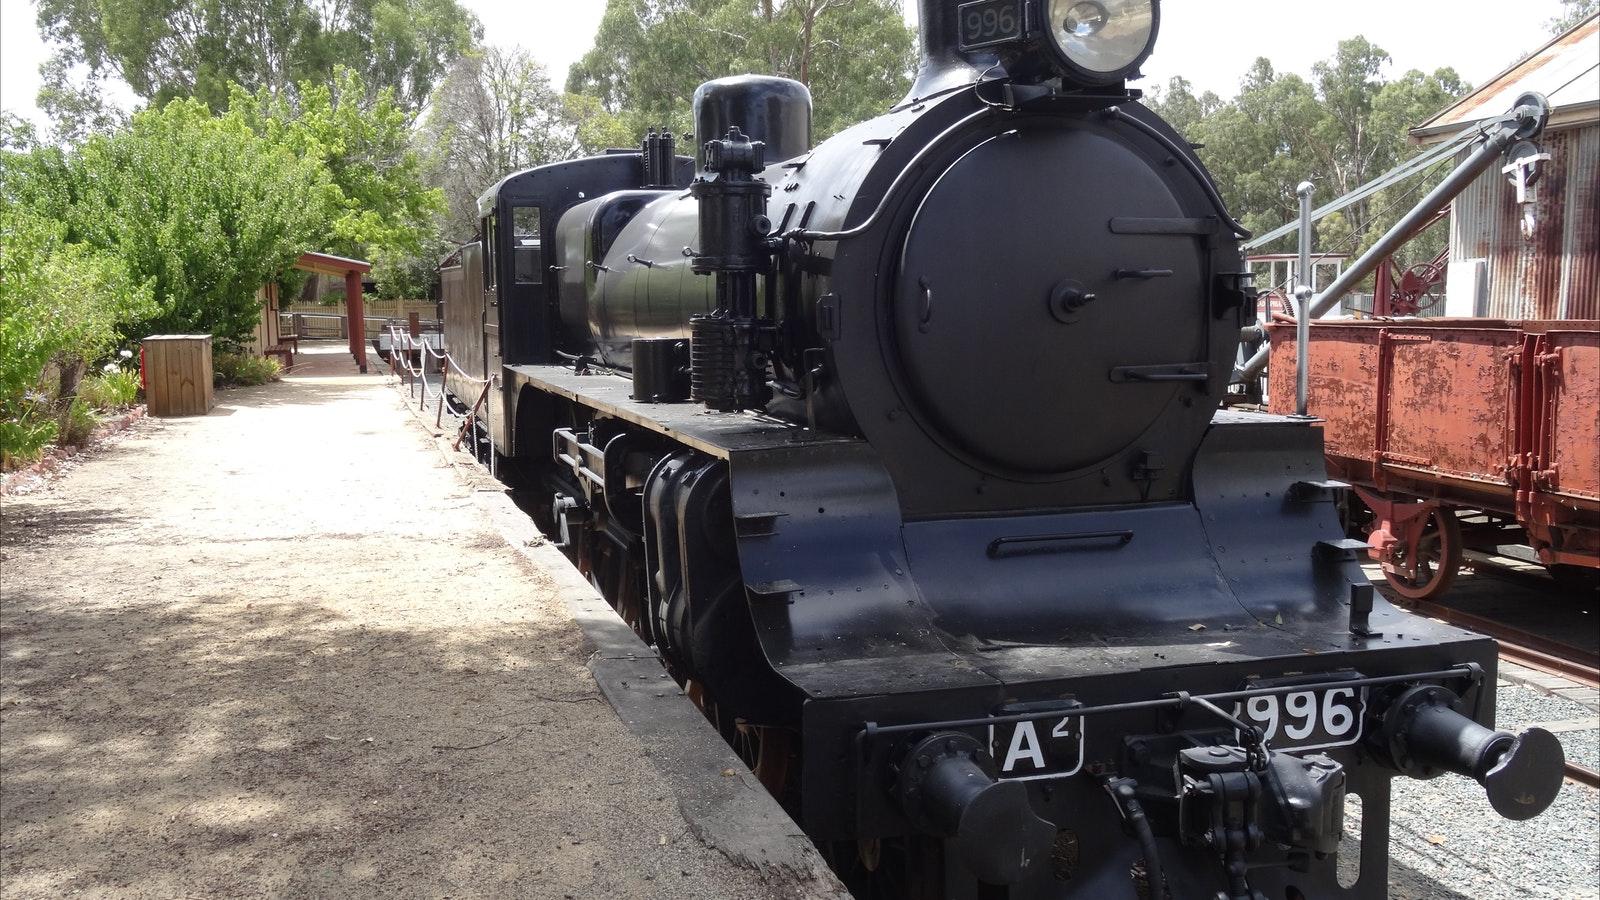 A2 locomotive